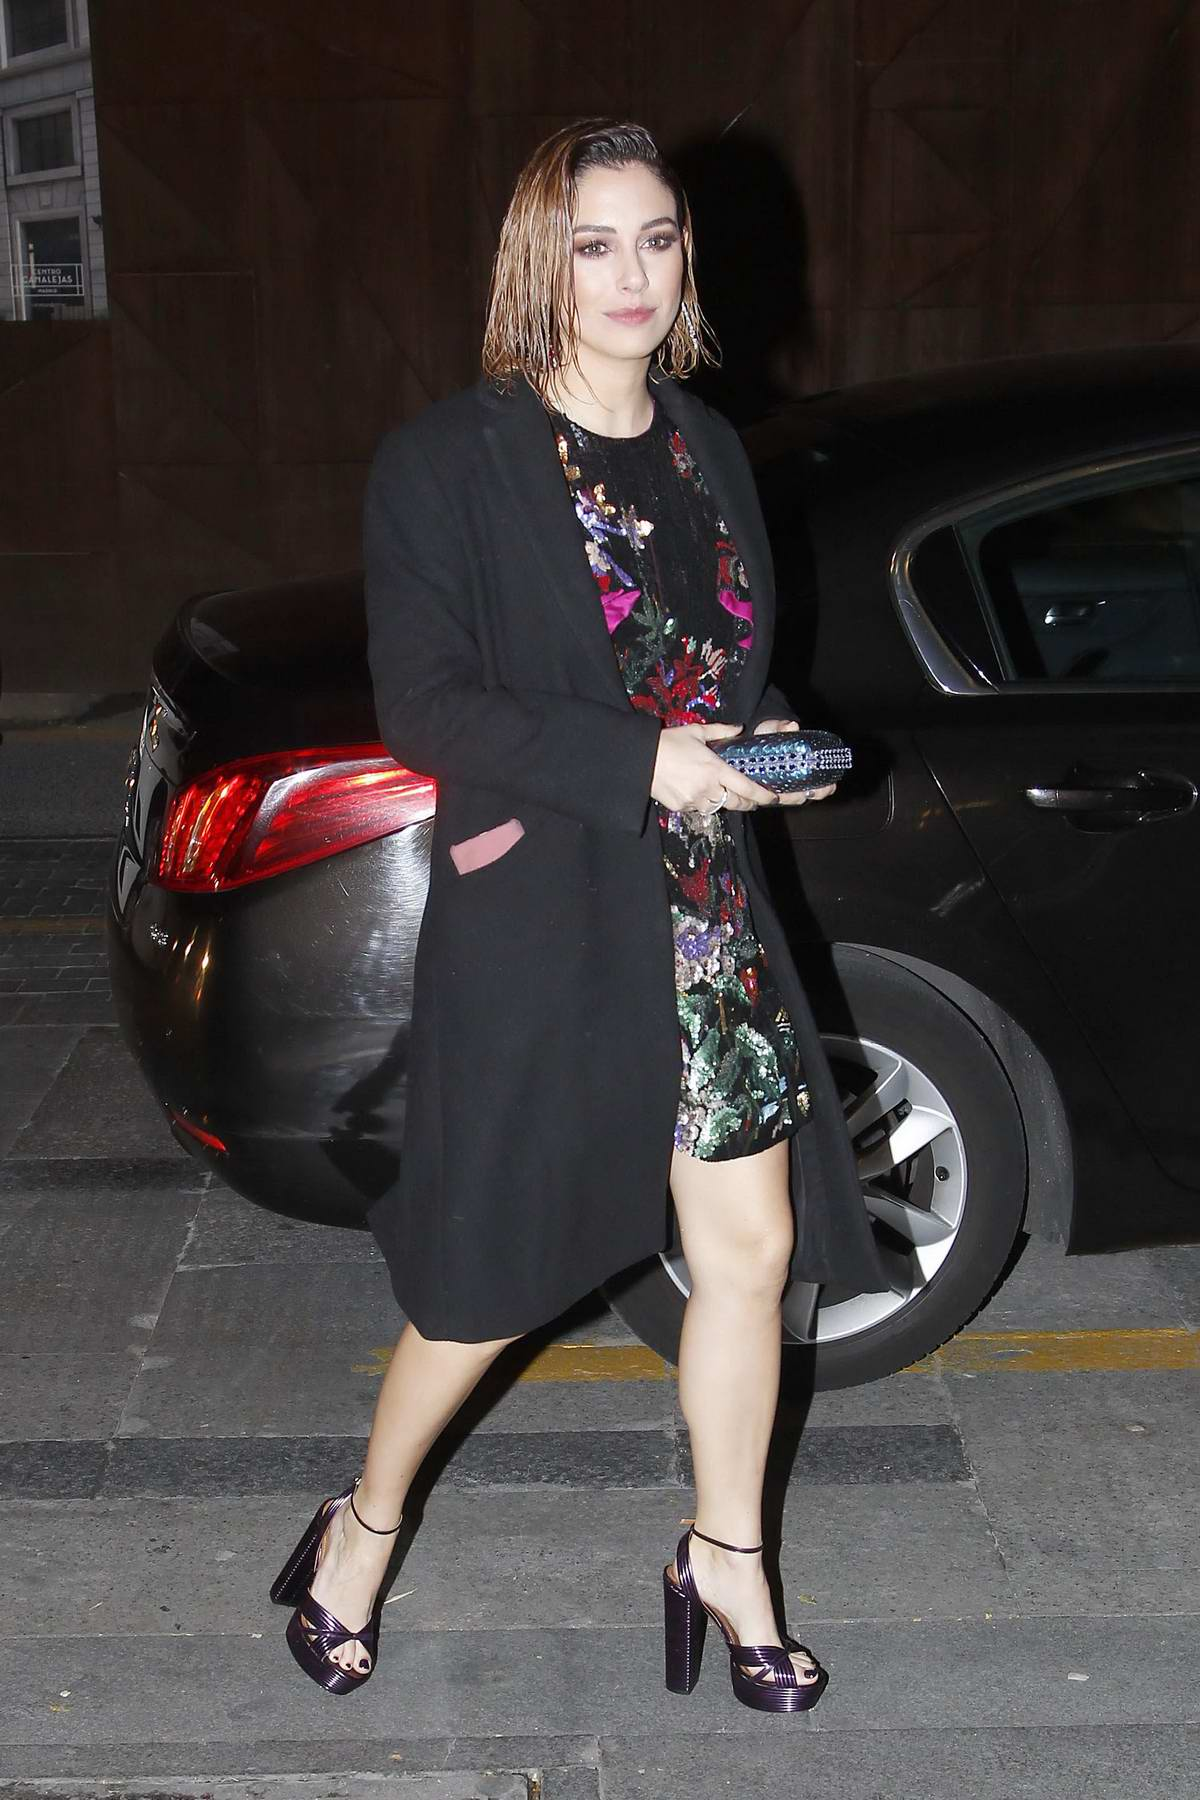 Blanca Suarez attends Harper's Bazaar party in Madrid, Spain